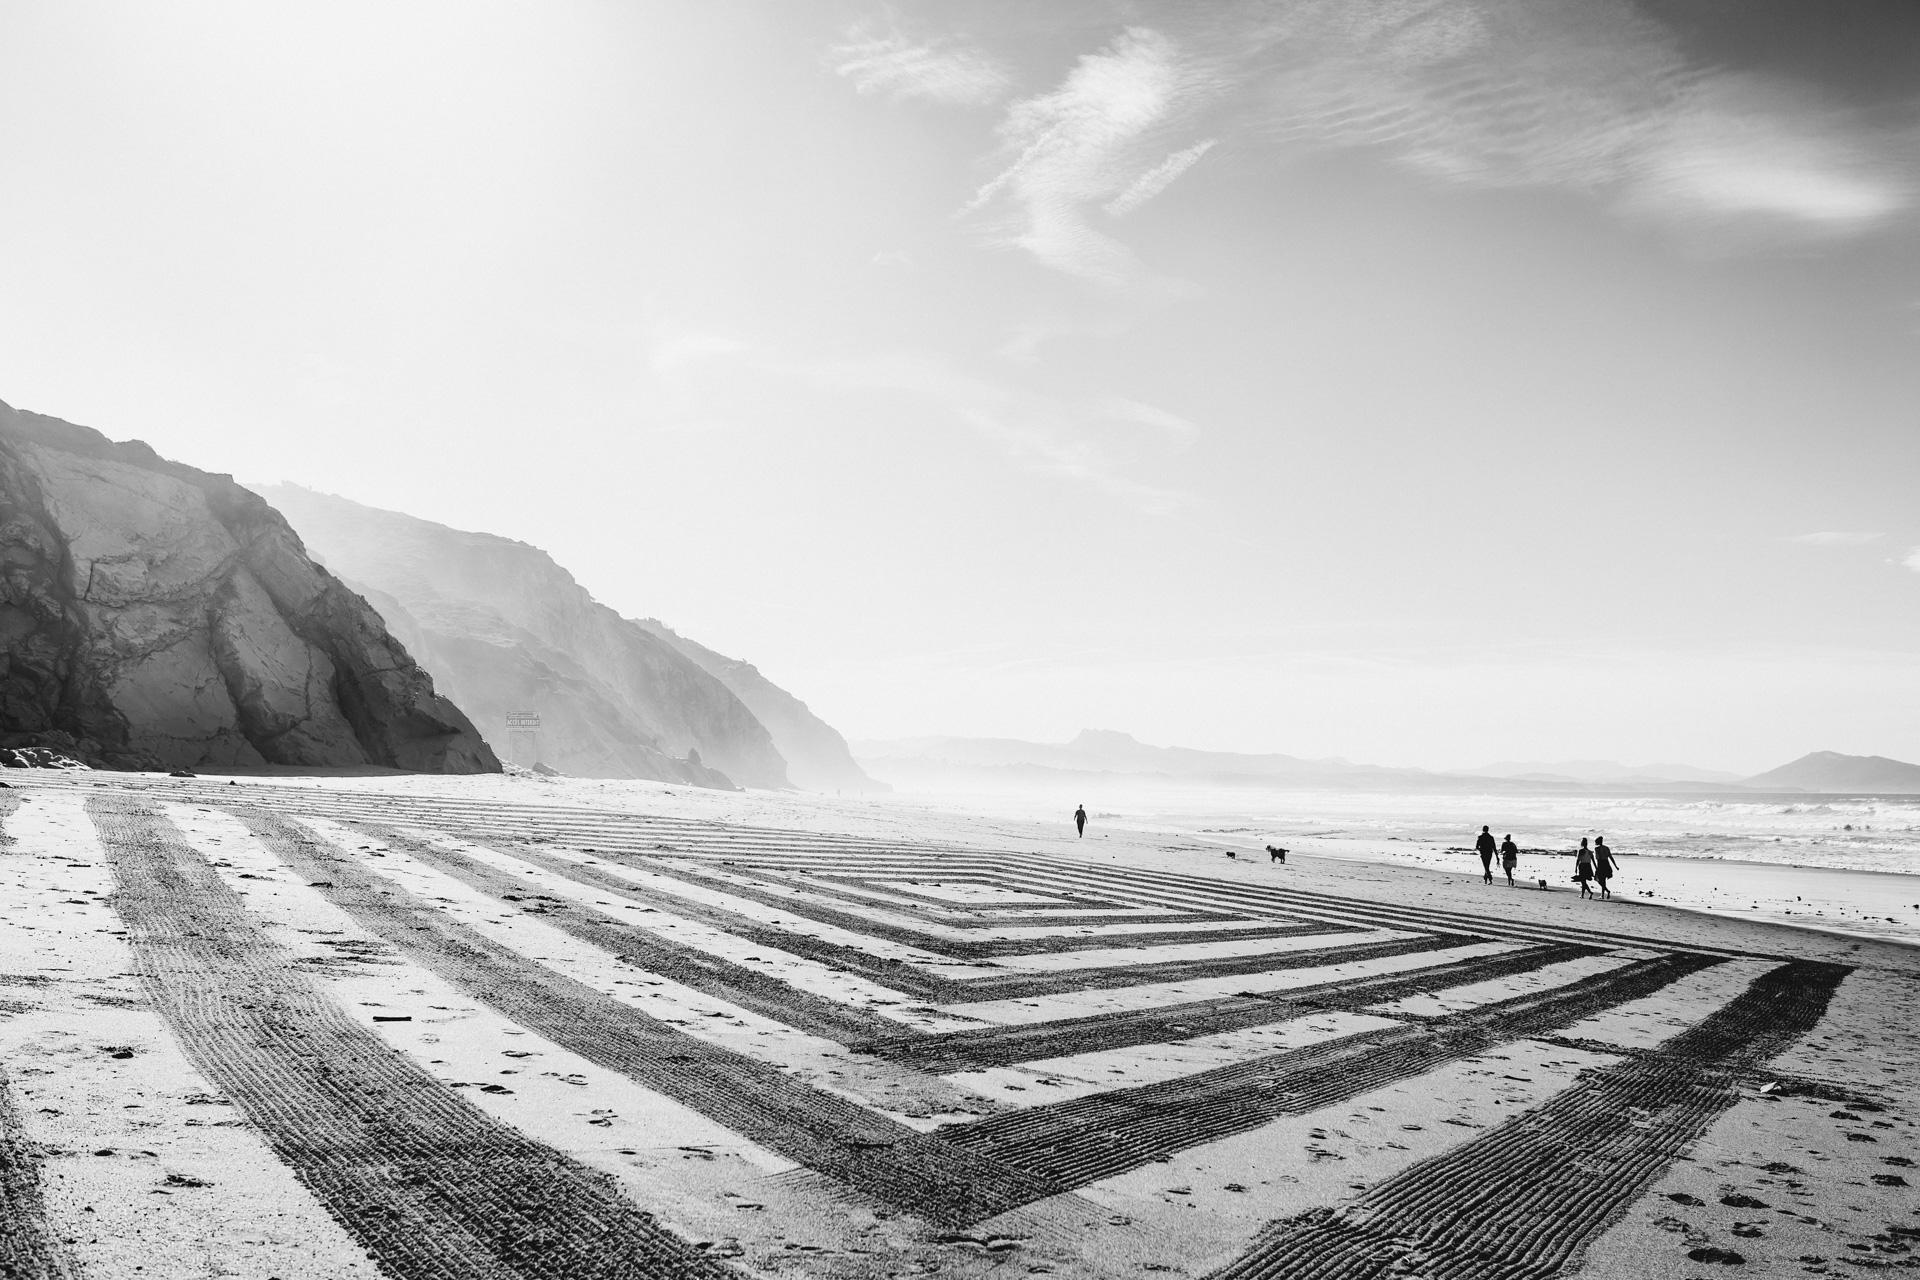 Damien-dohmen-sand-print-lx-one-28